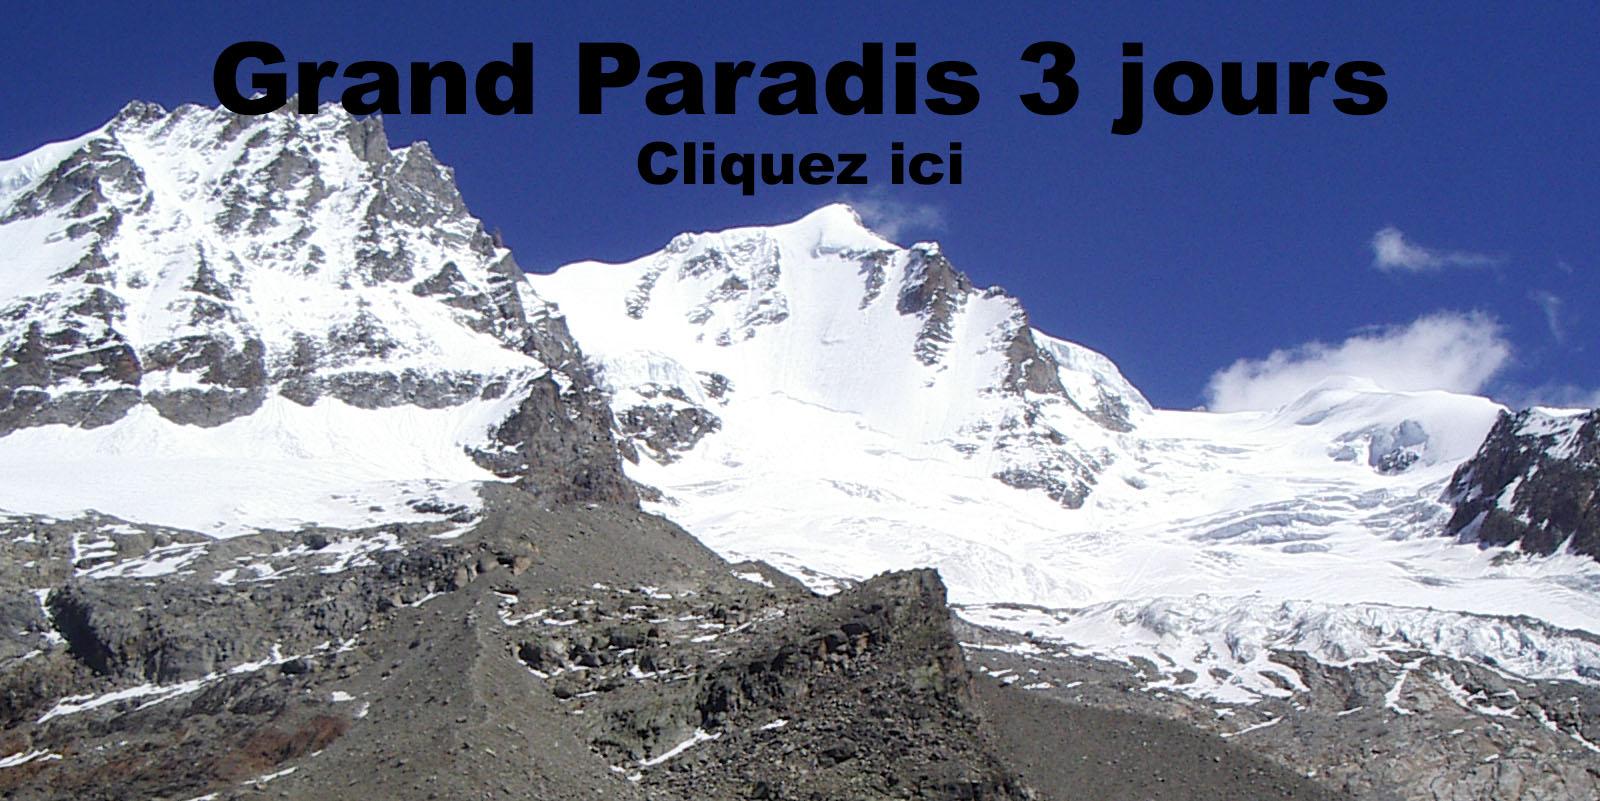 Grand Paradis 3 jours 1600x800